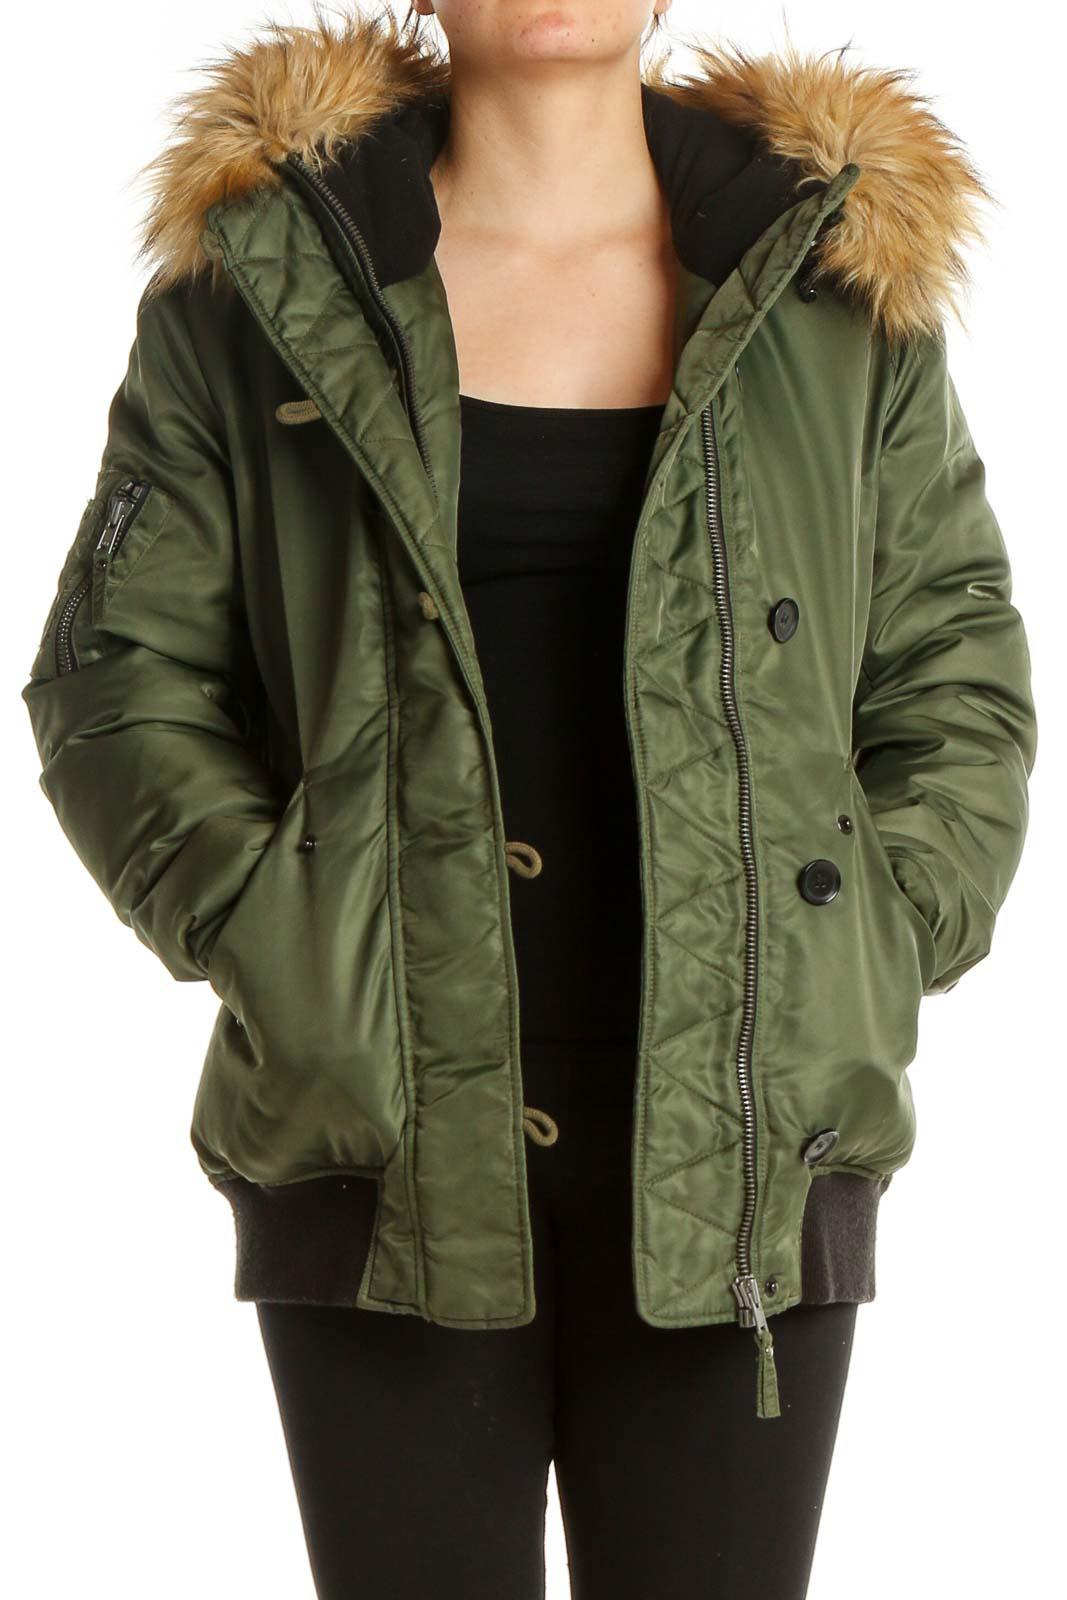 Green Parka Jacket Front